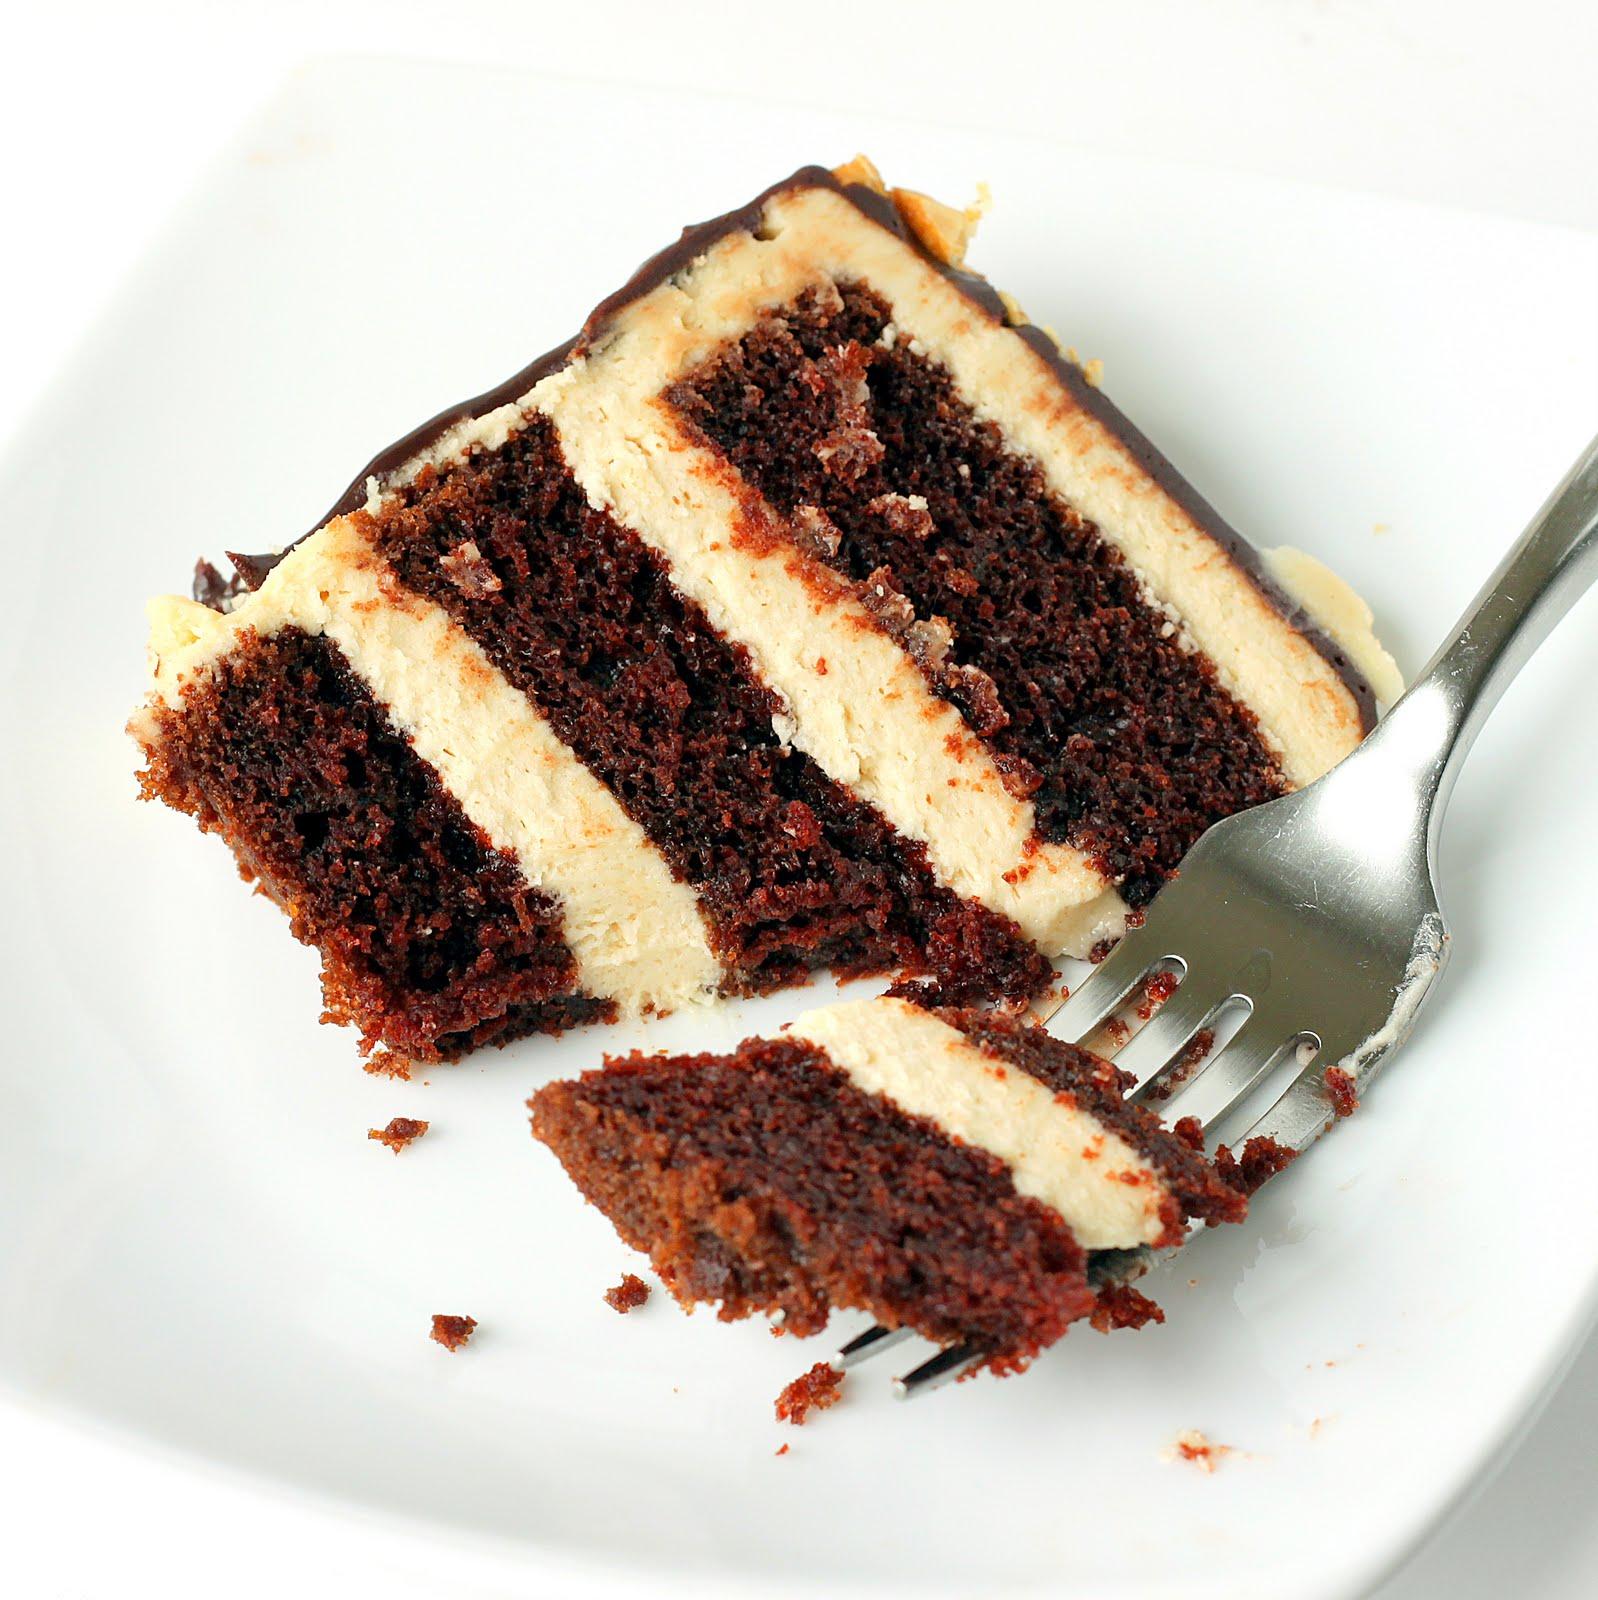 Sugar Cooking: Chocolate Peanut Butter Cake